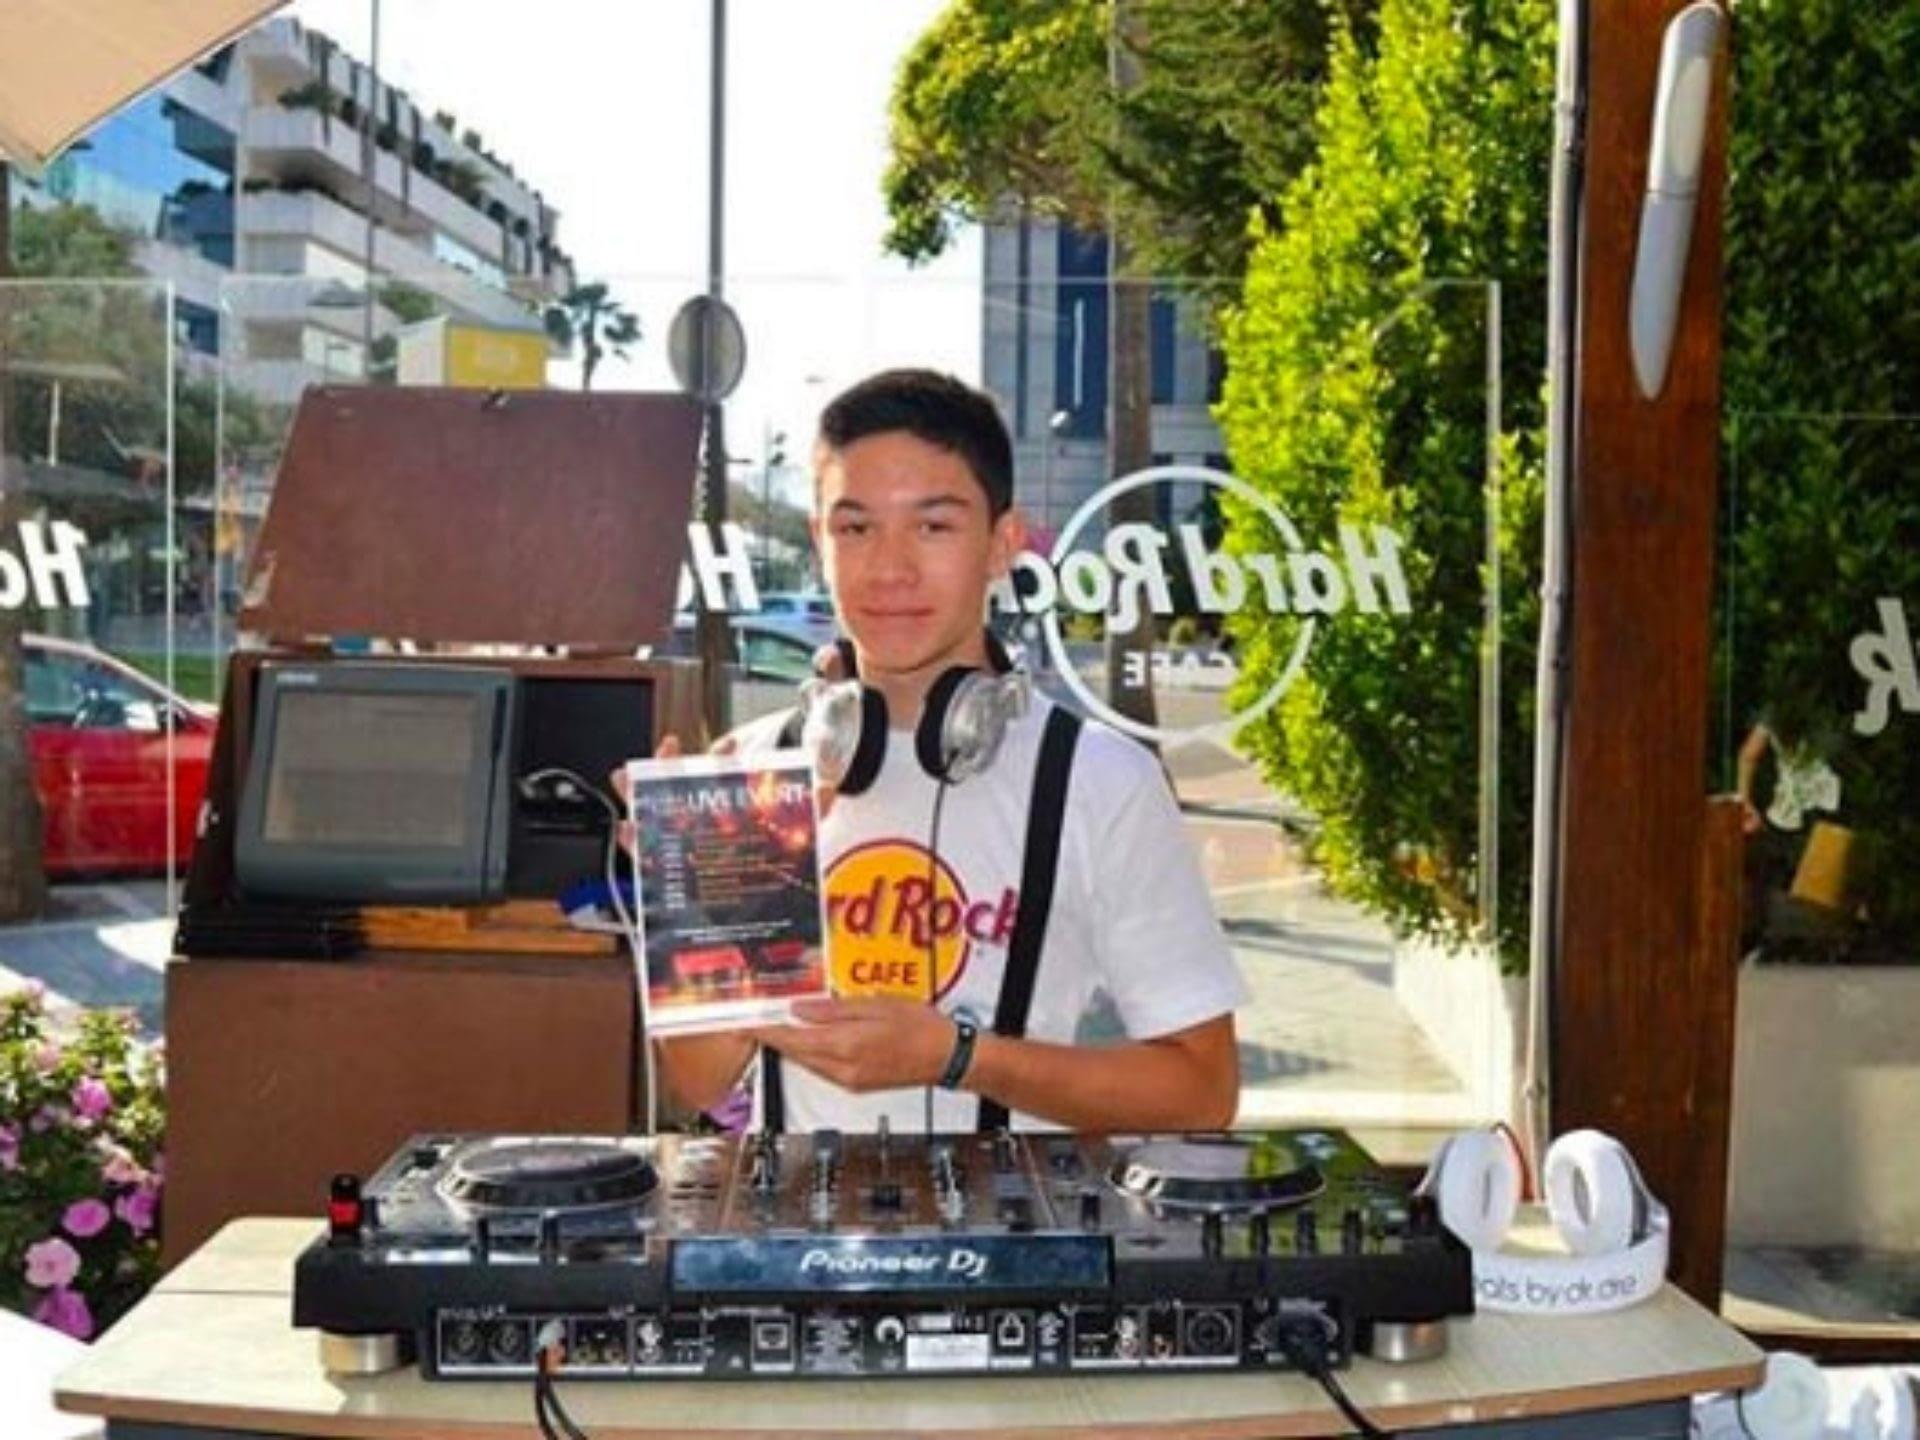 Max DJ-elev live @ Hard Rock Café